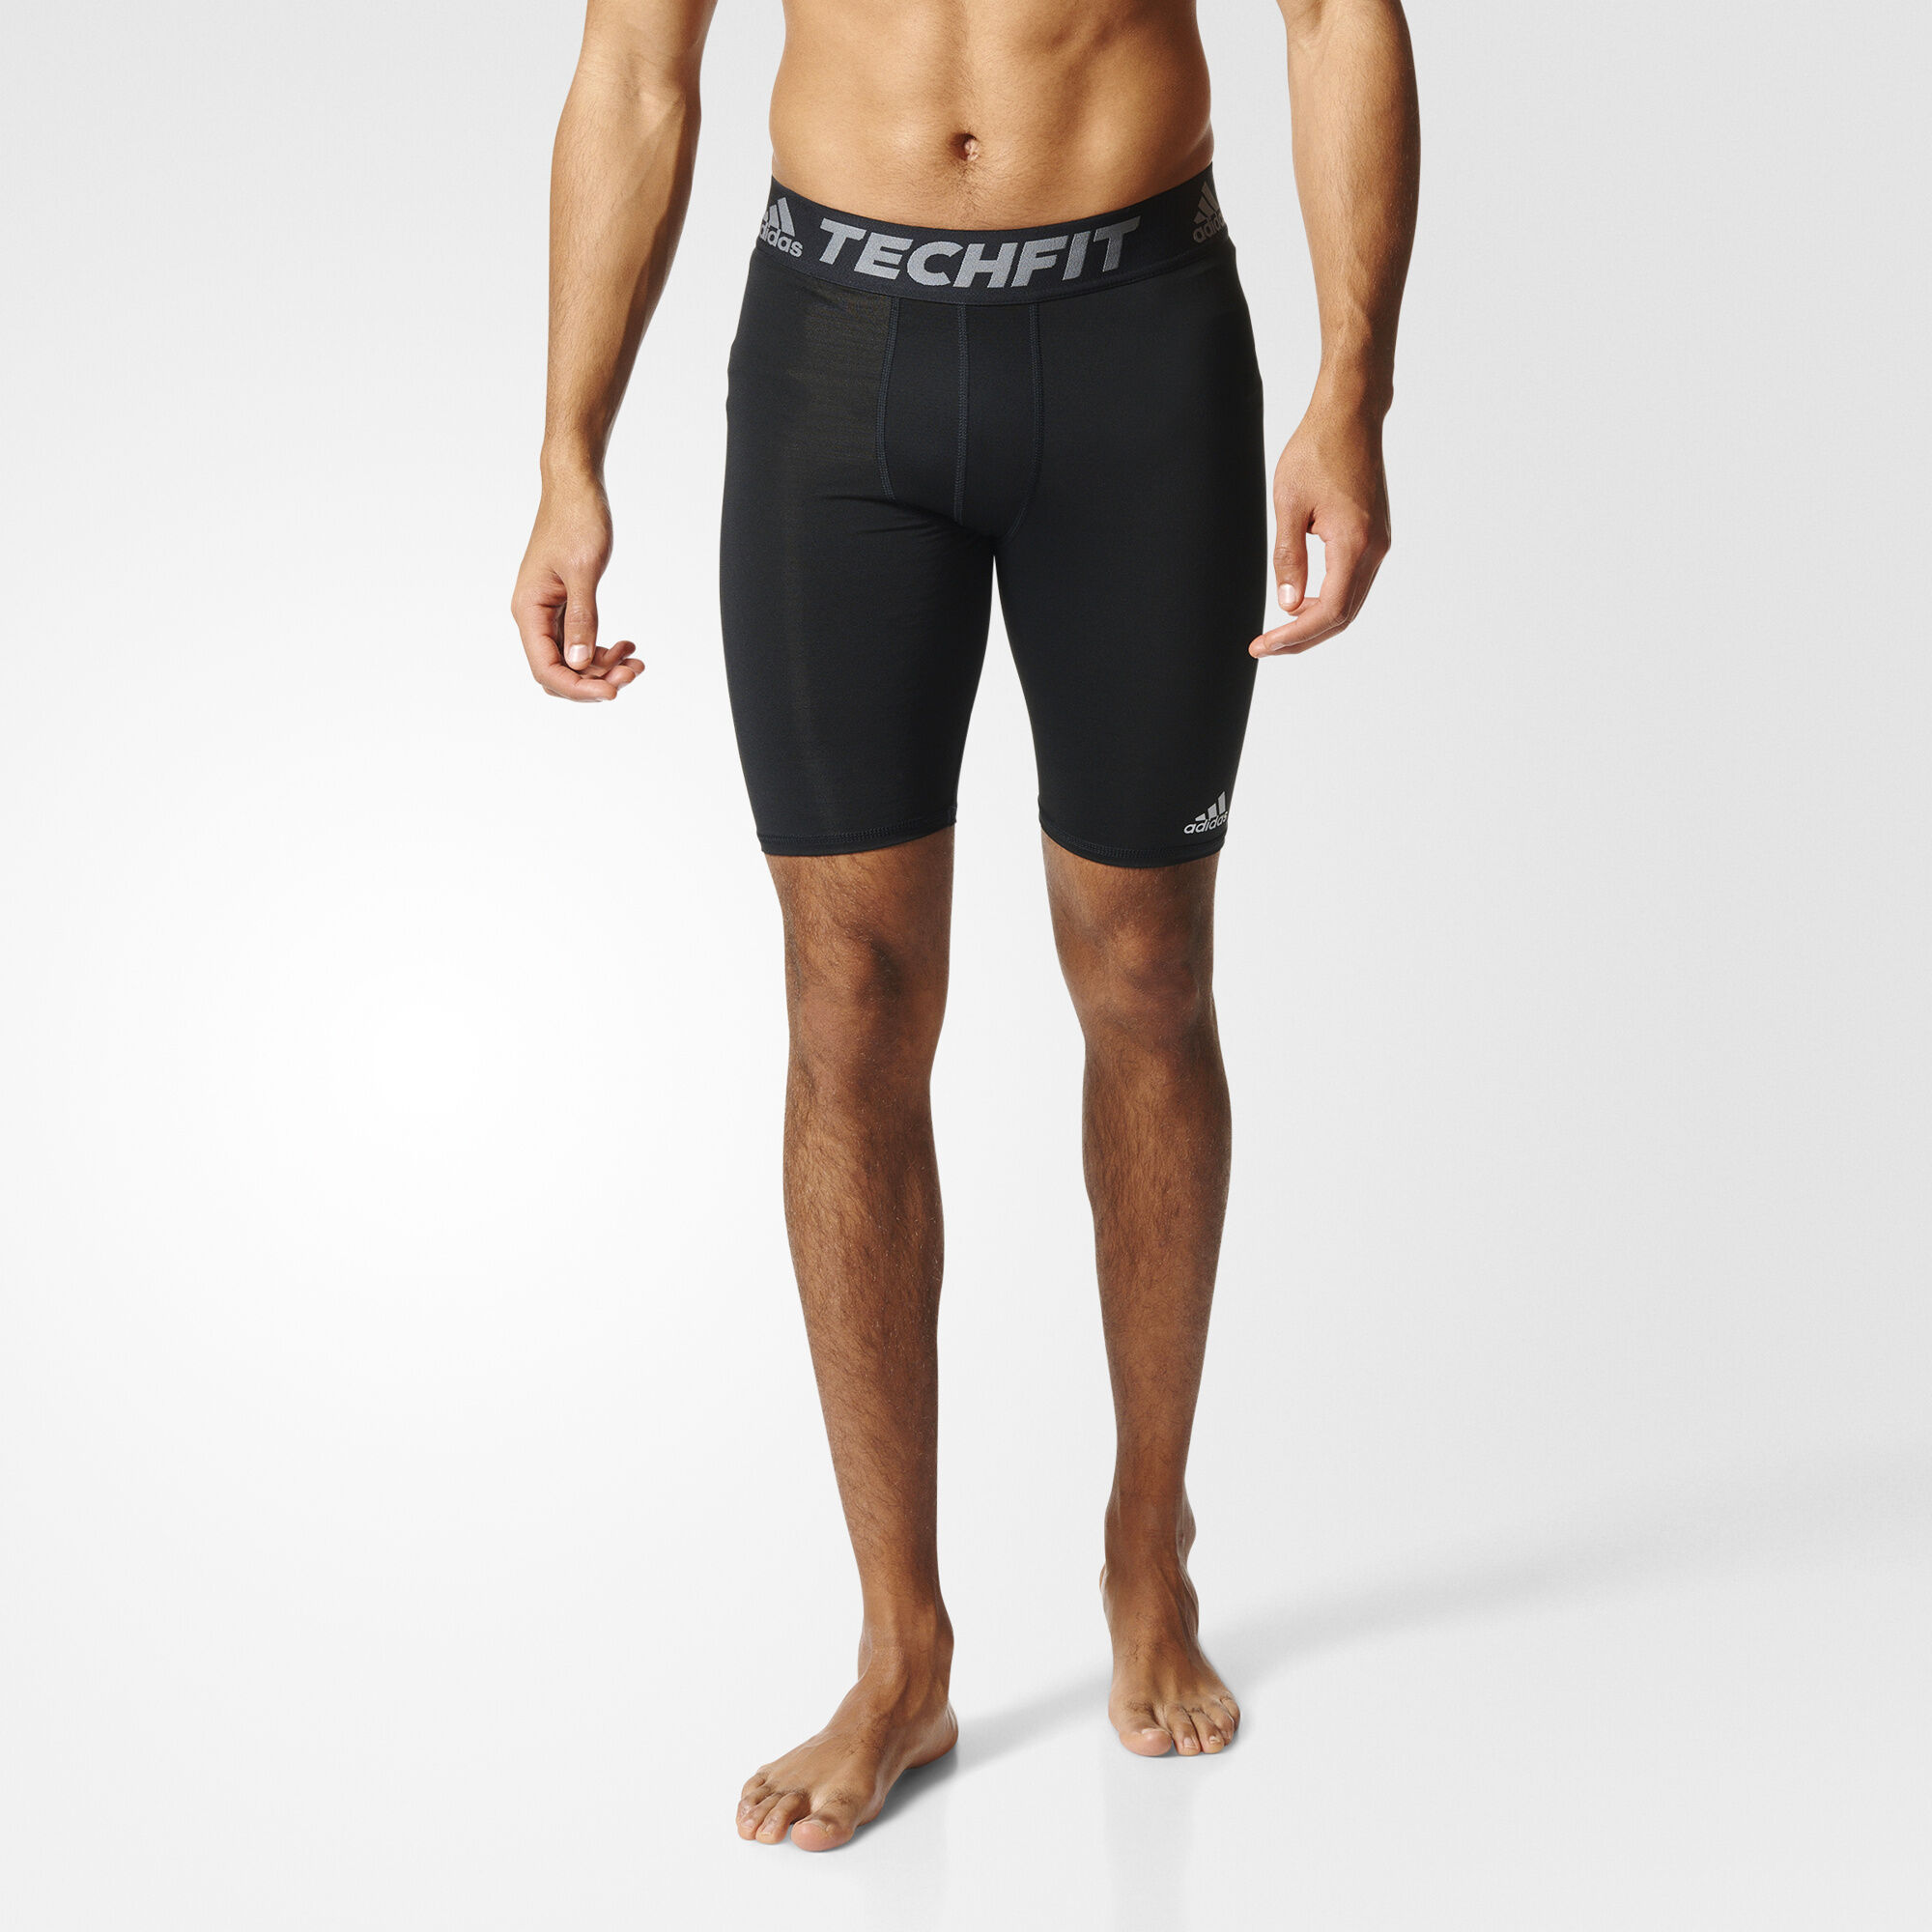 tights: womens leggings, workout & yoga pants | adidas us